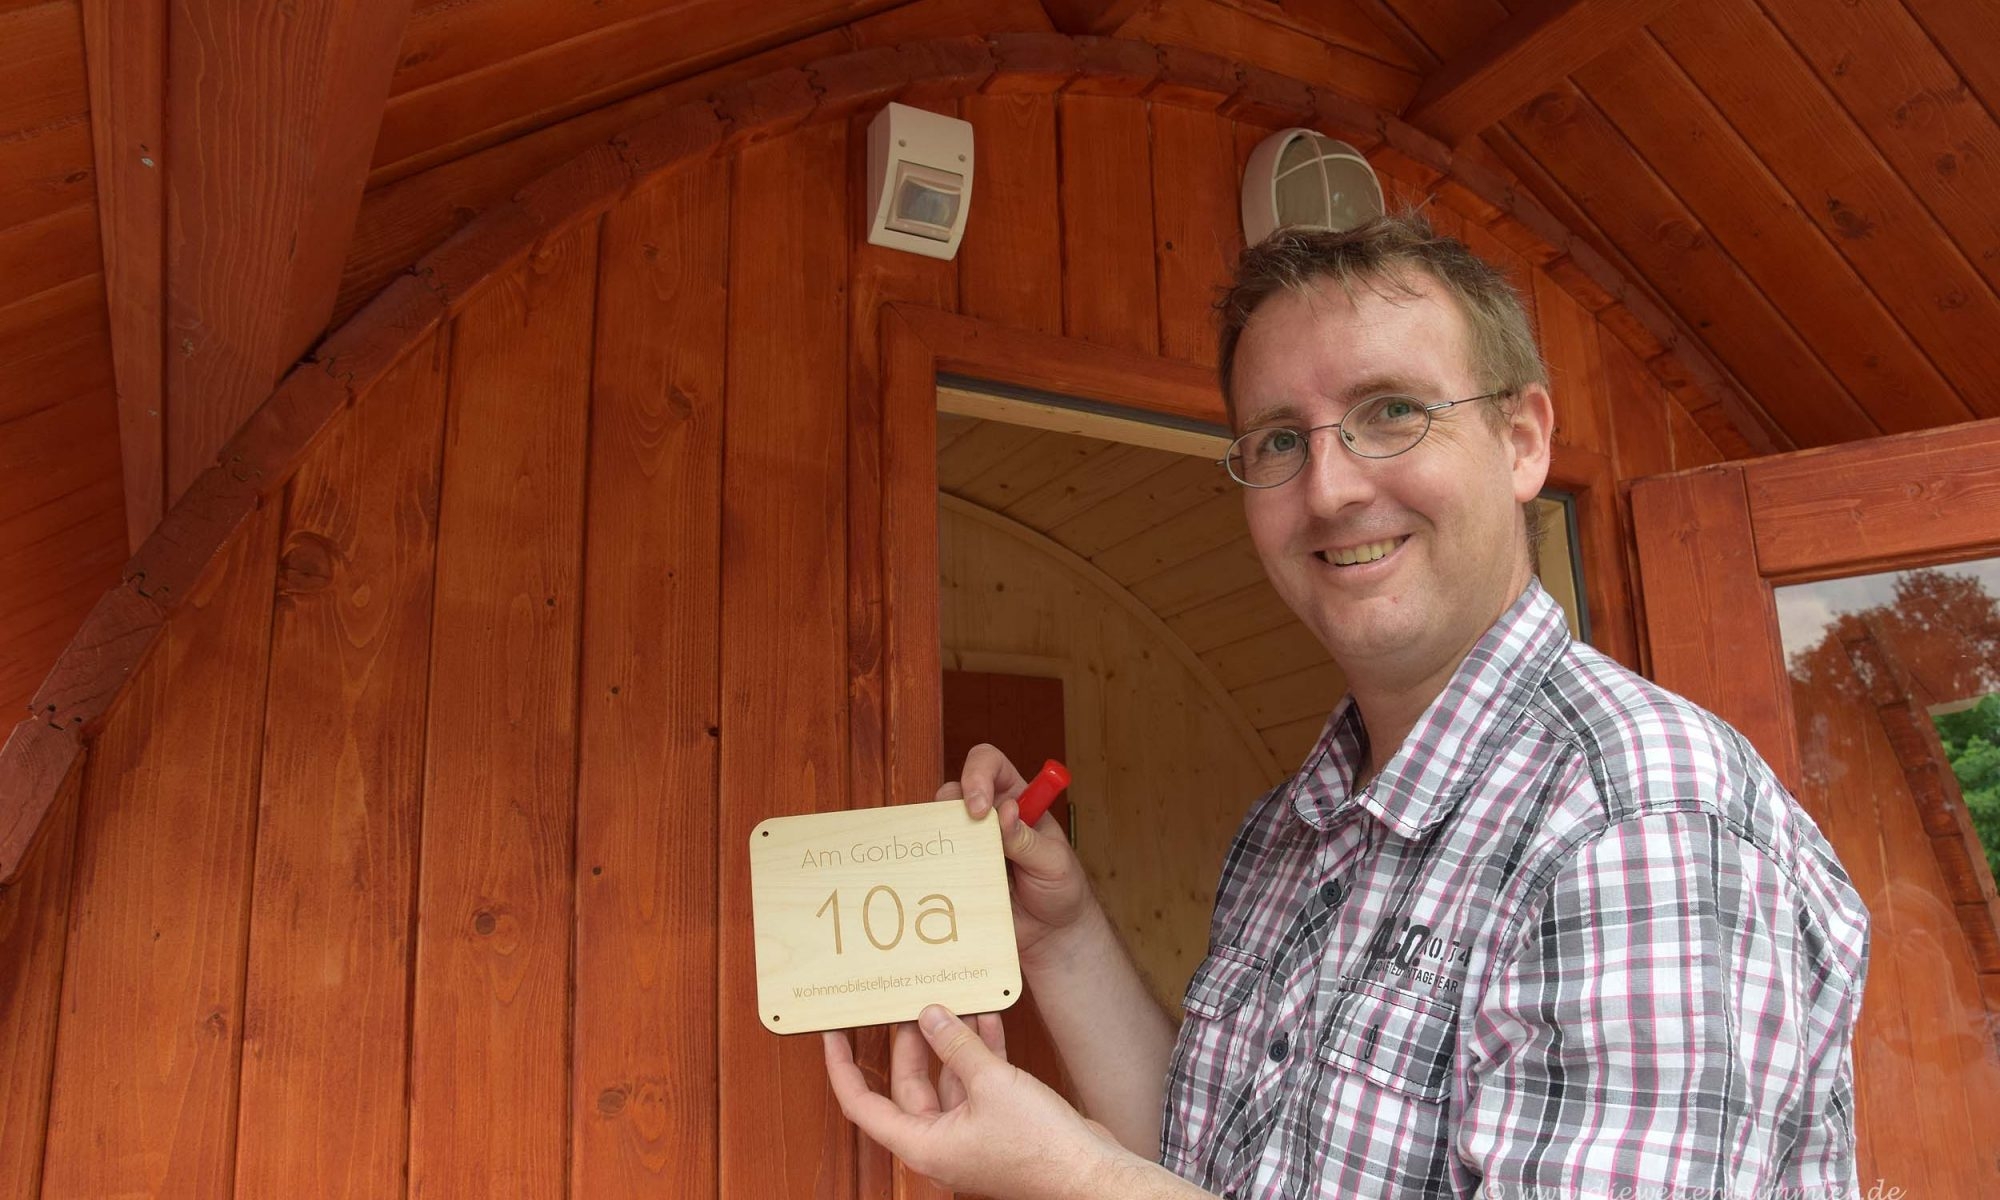 Die erste Hausnummer